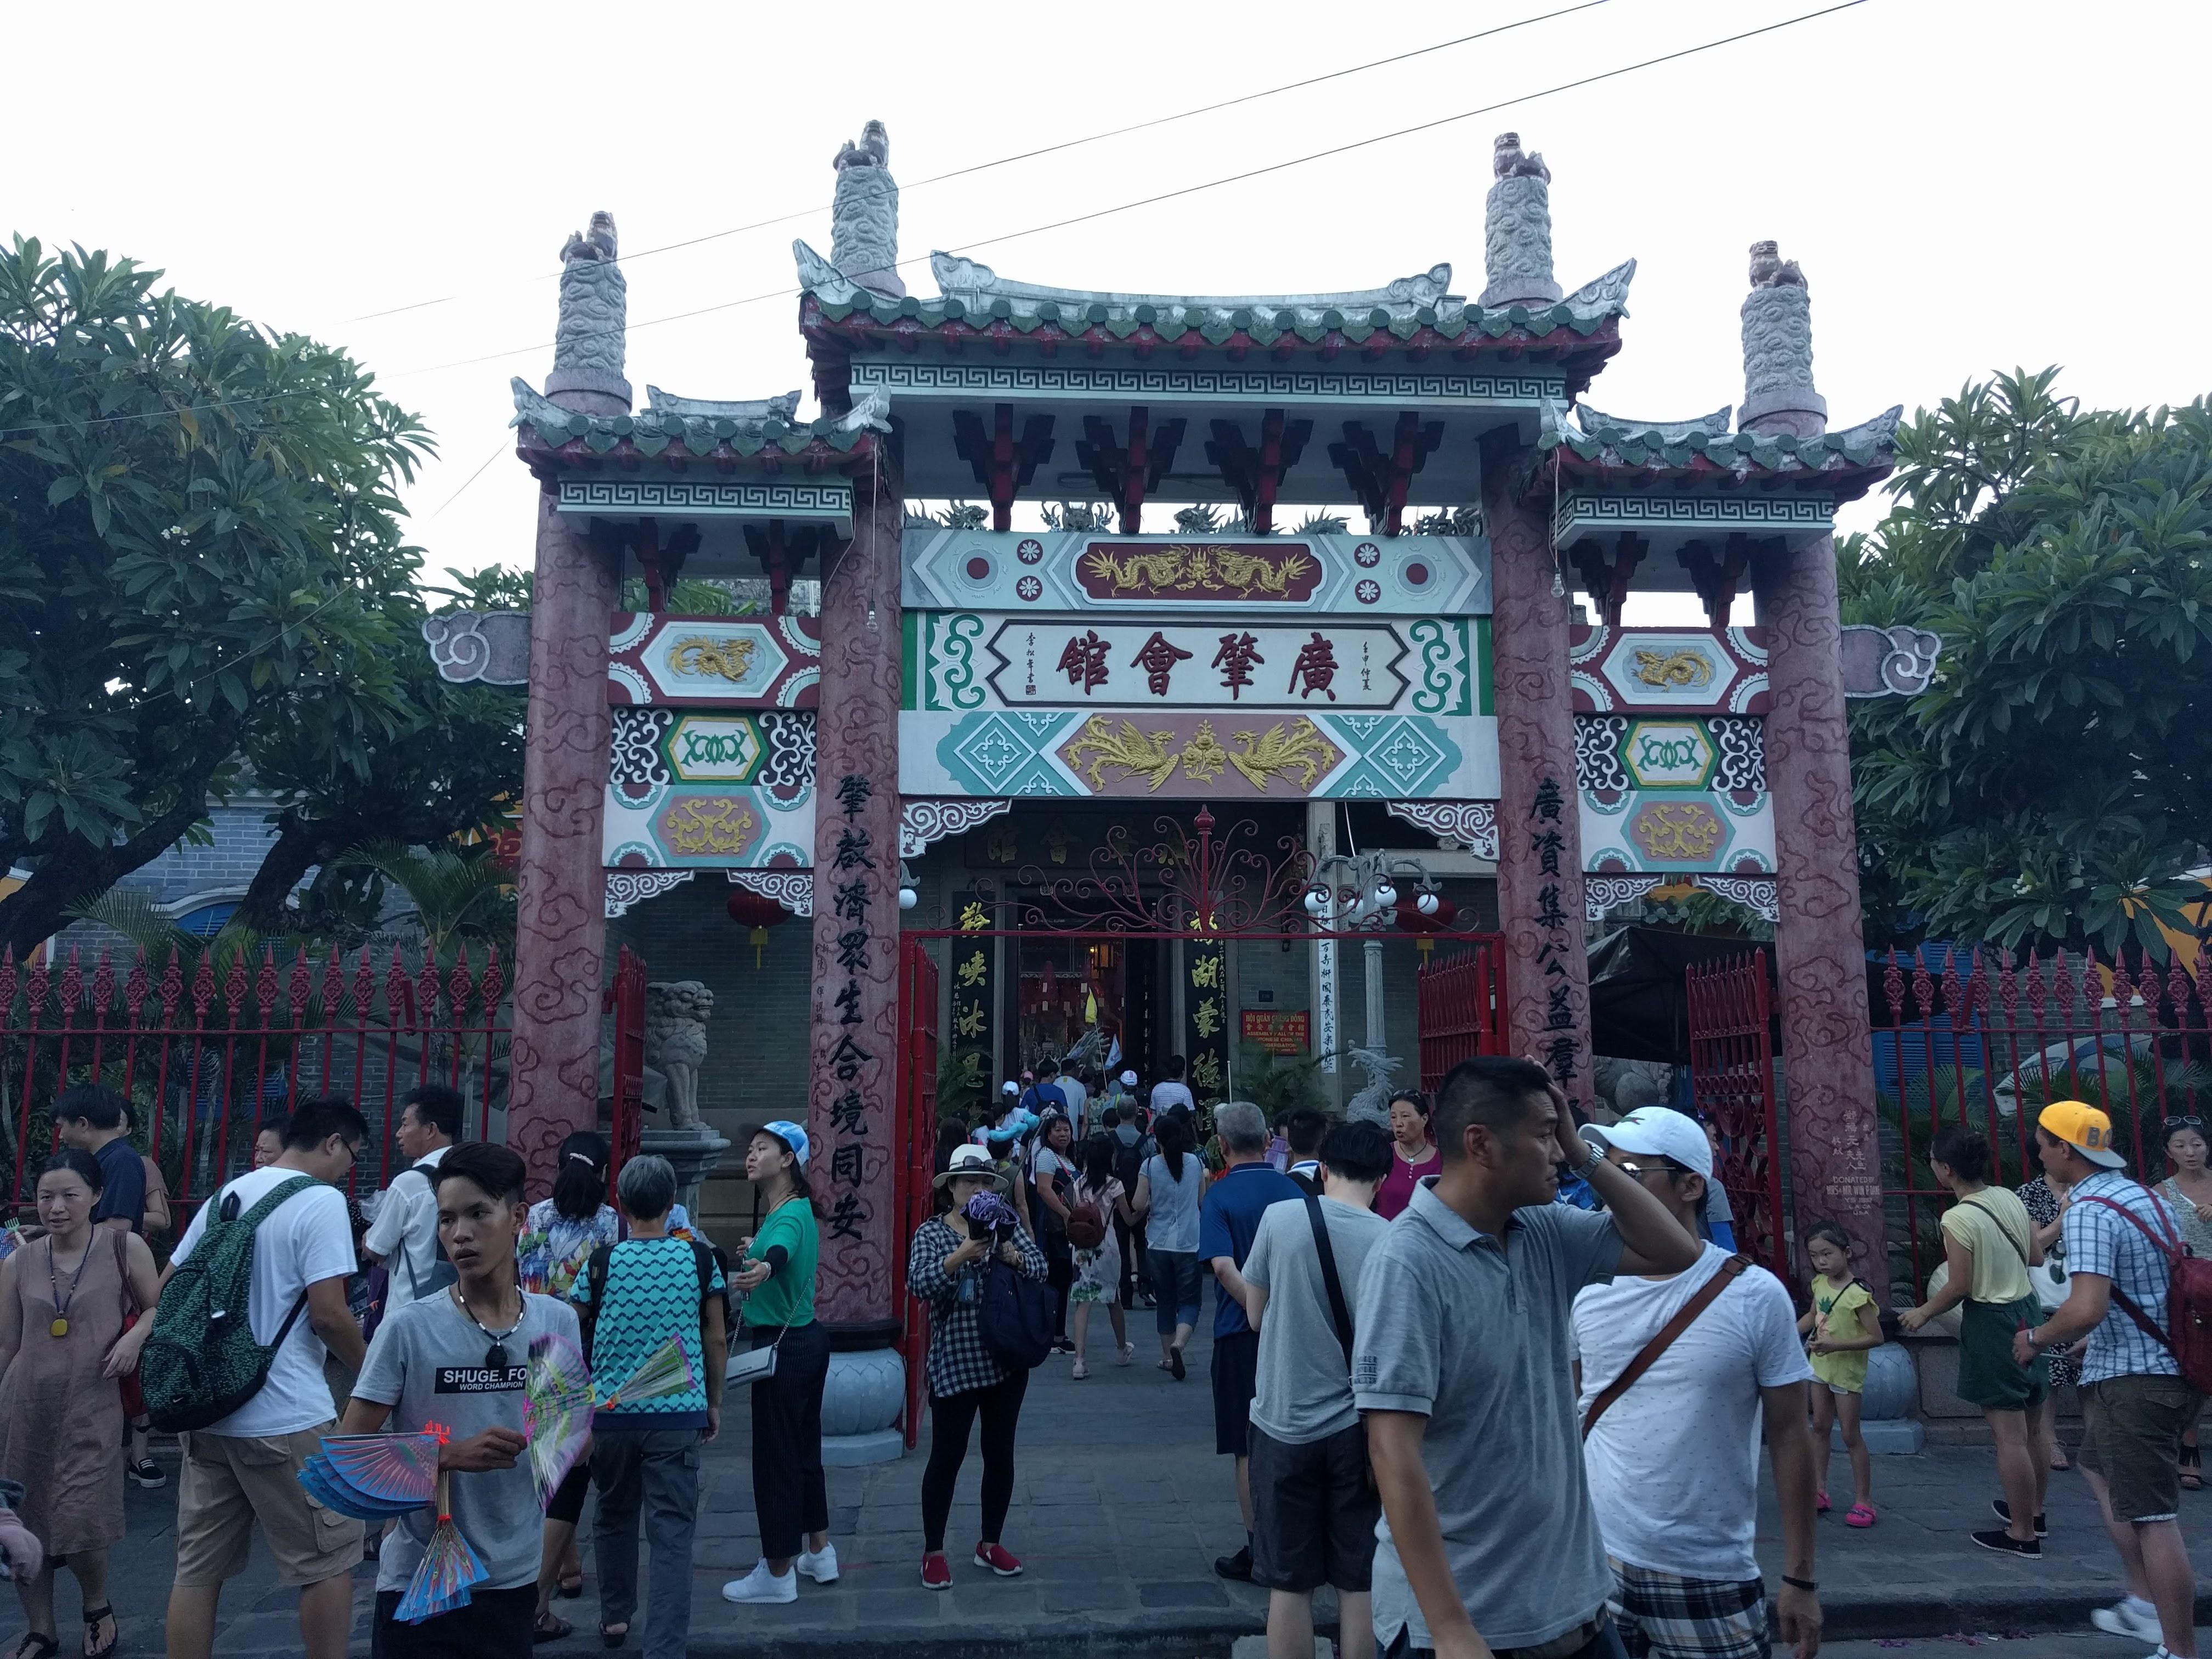 Arche Hoi An